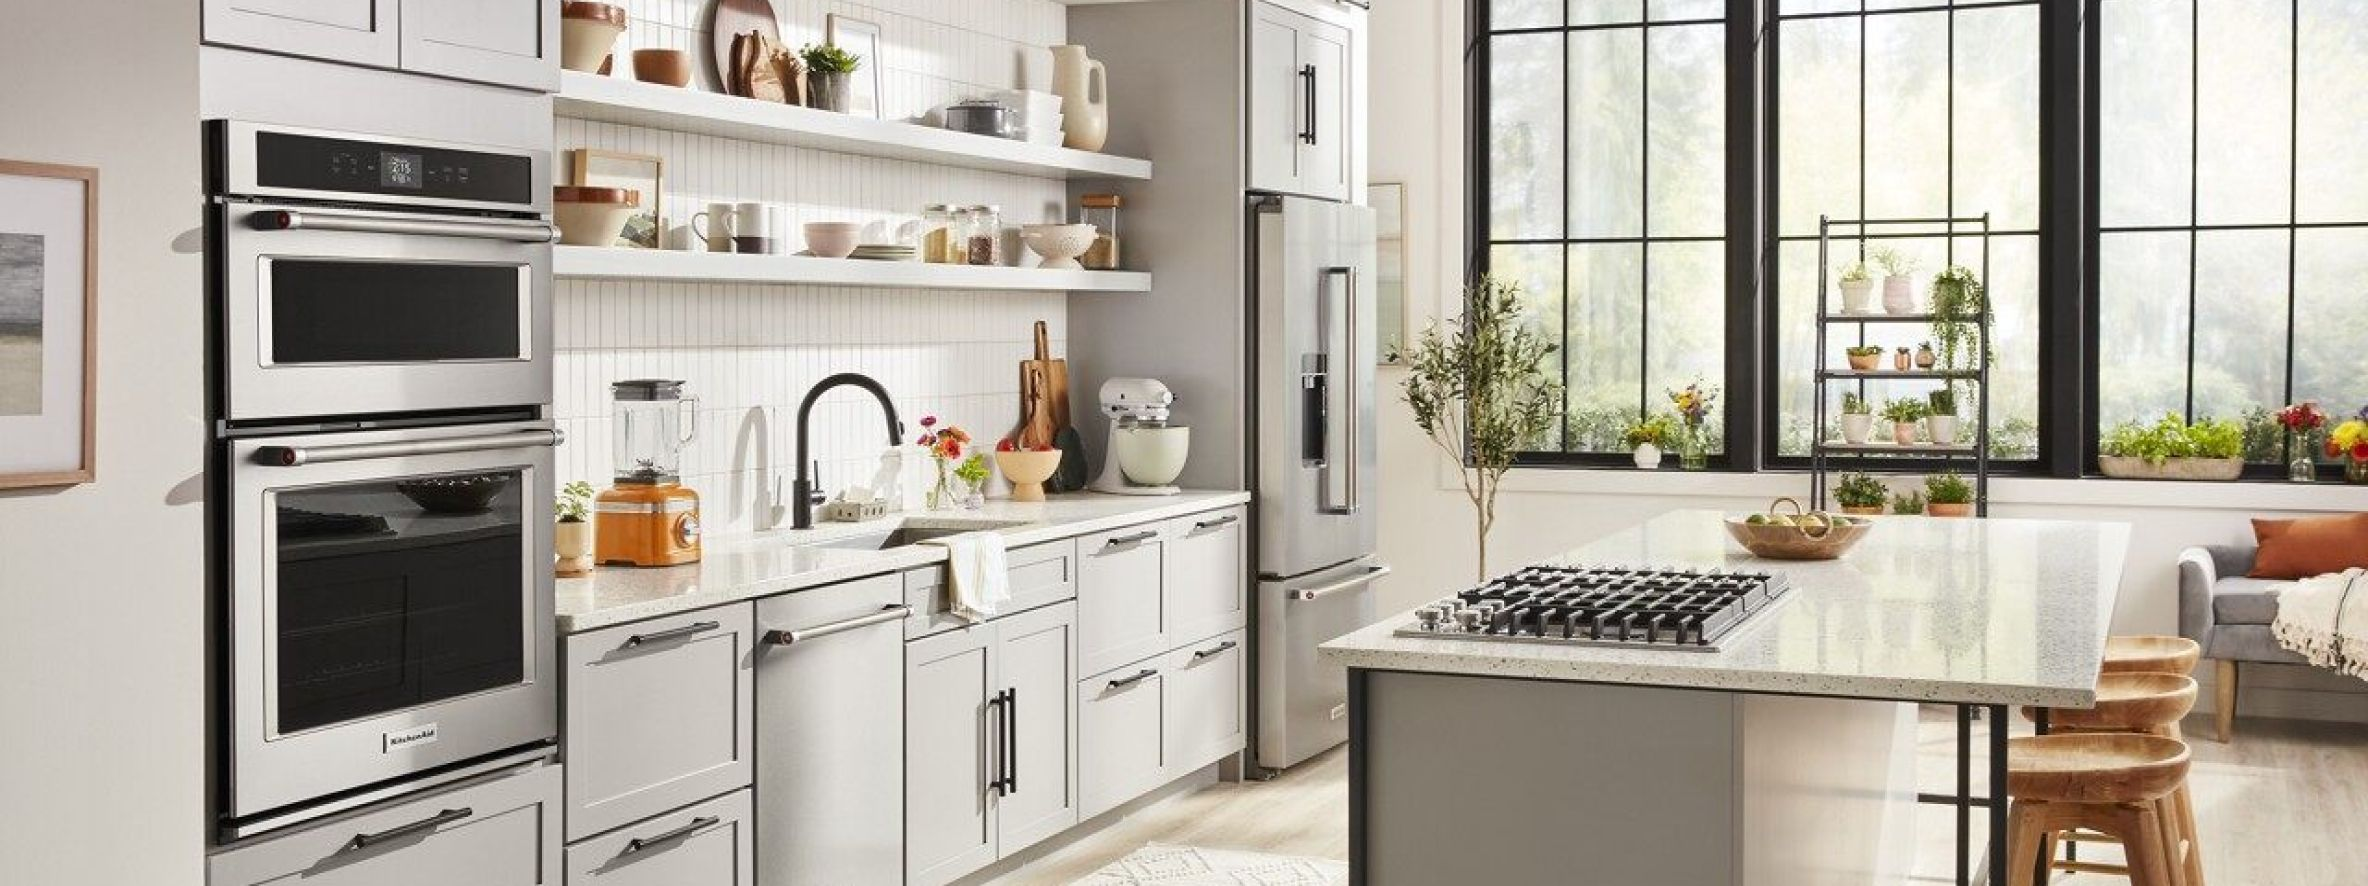 KitchenAid® appliances shown installed in a modern kitchen and bar area.